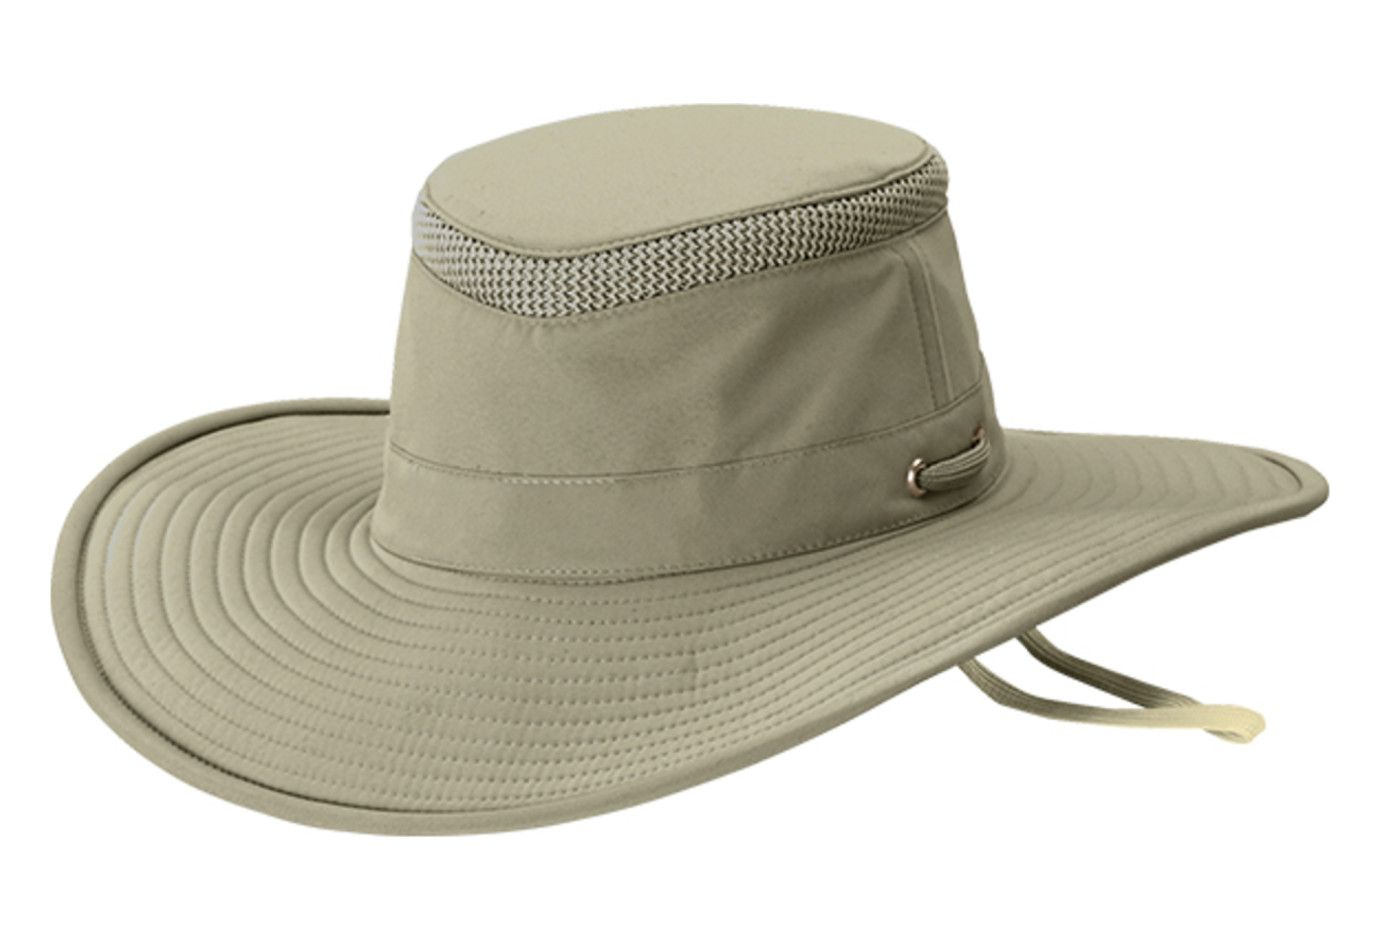 Tilley LTM2 Broadest Brim Lightweight Airflo Hat Khaki   Olive - size 7 1 2 e579a0d19f2